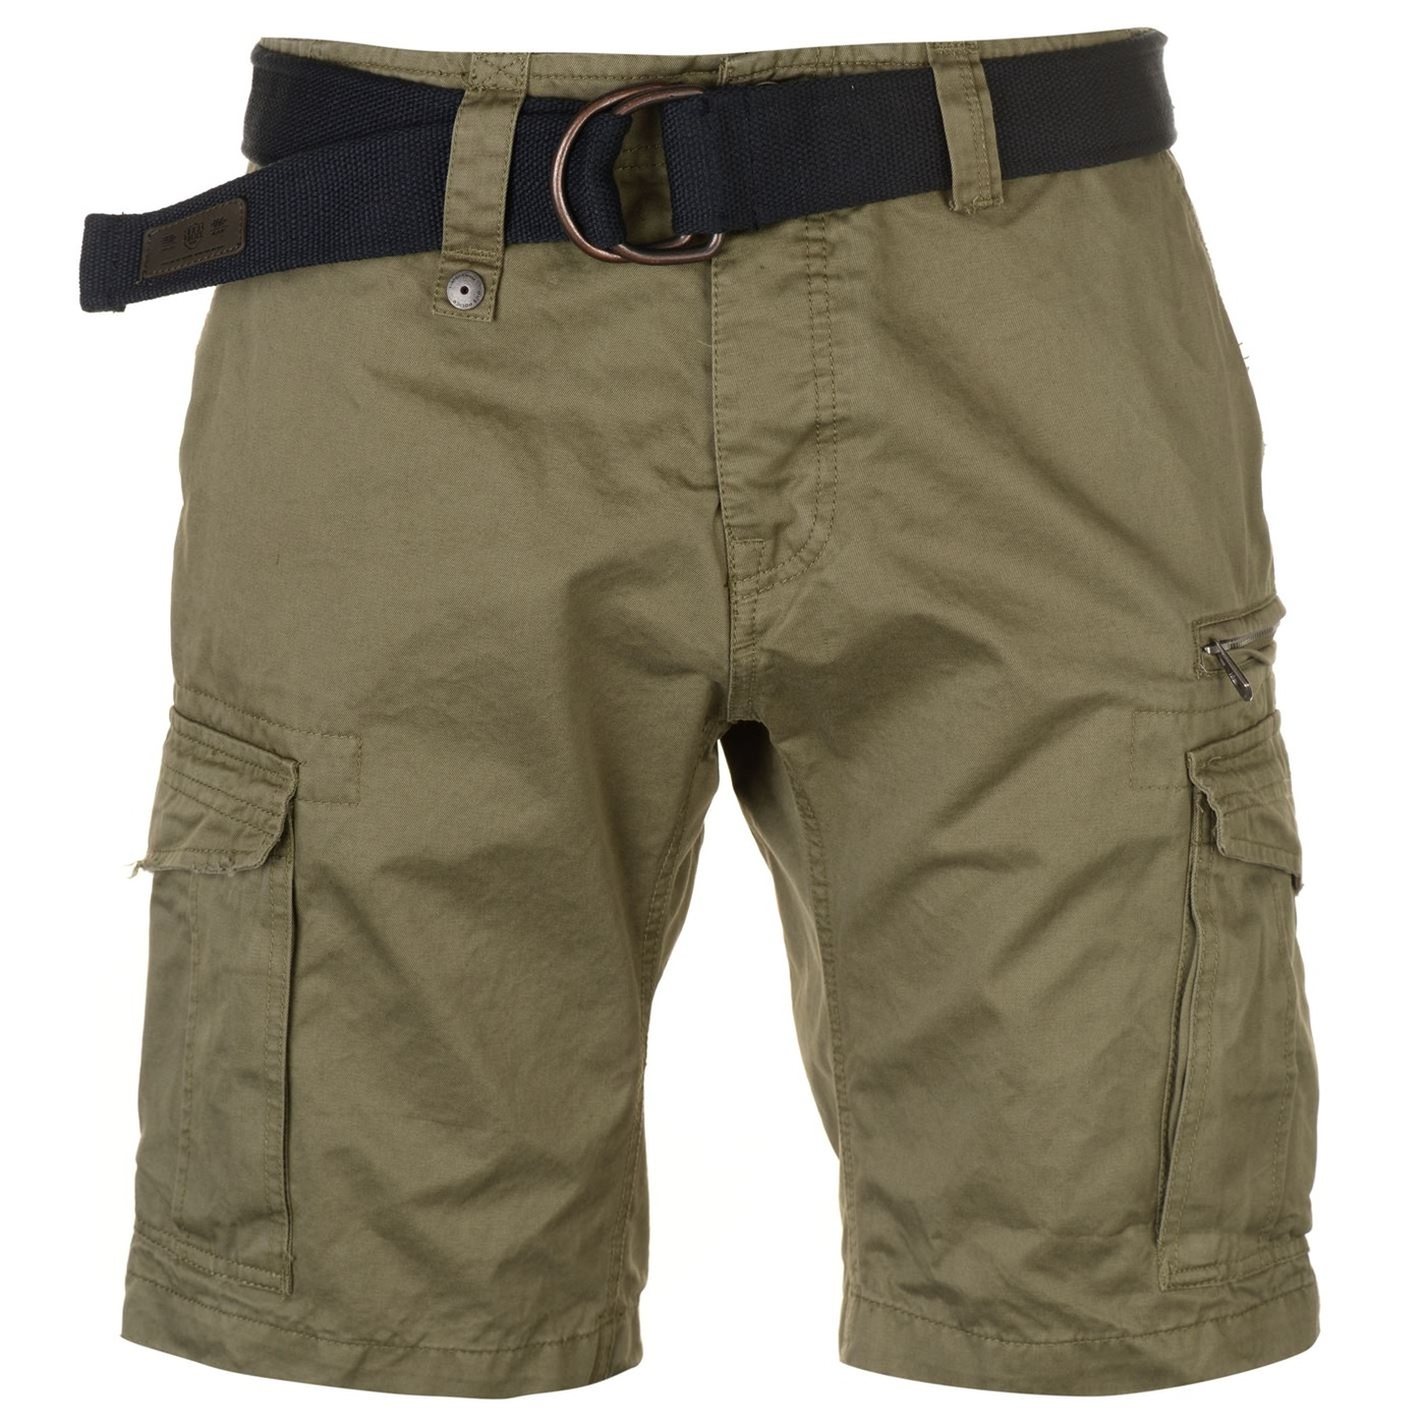 883 Police Gabe Shorts